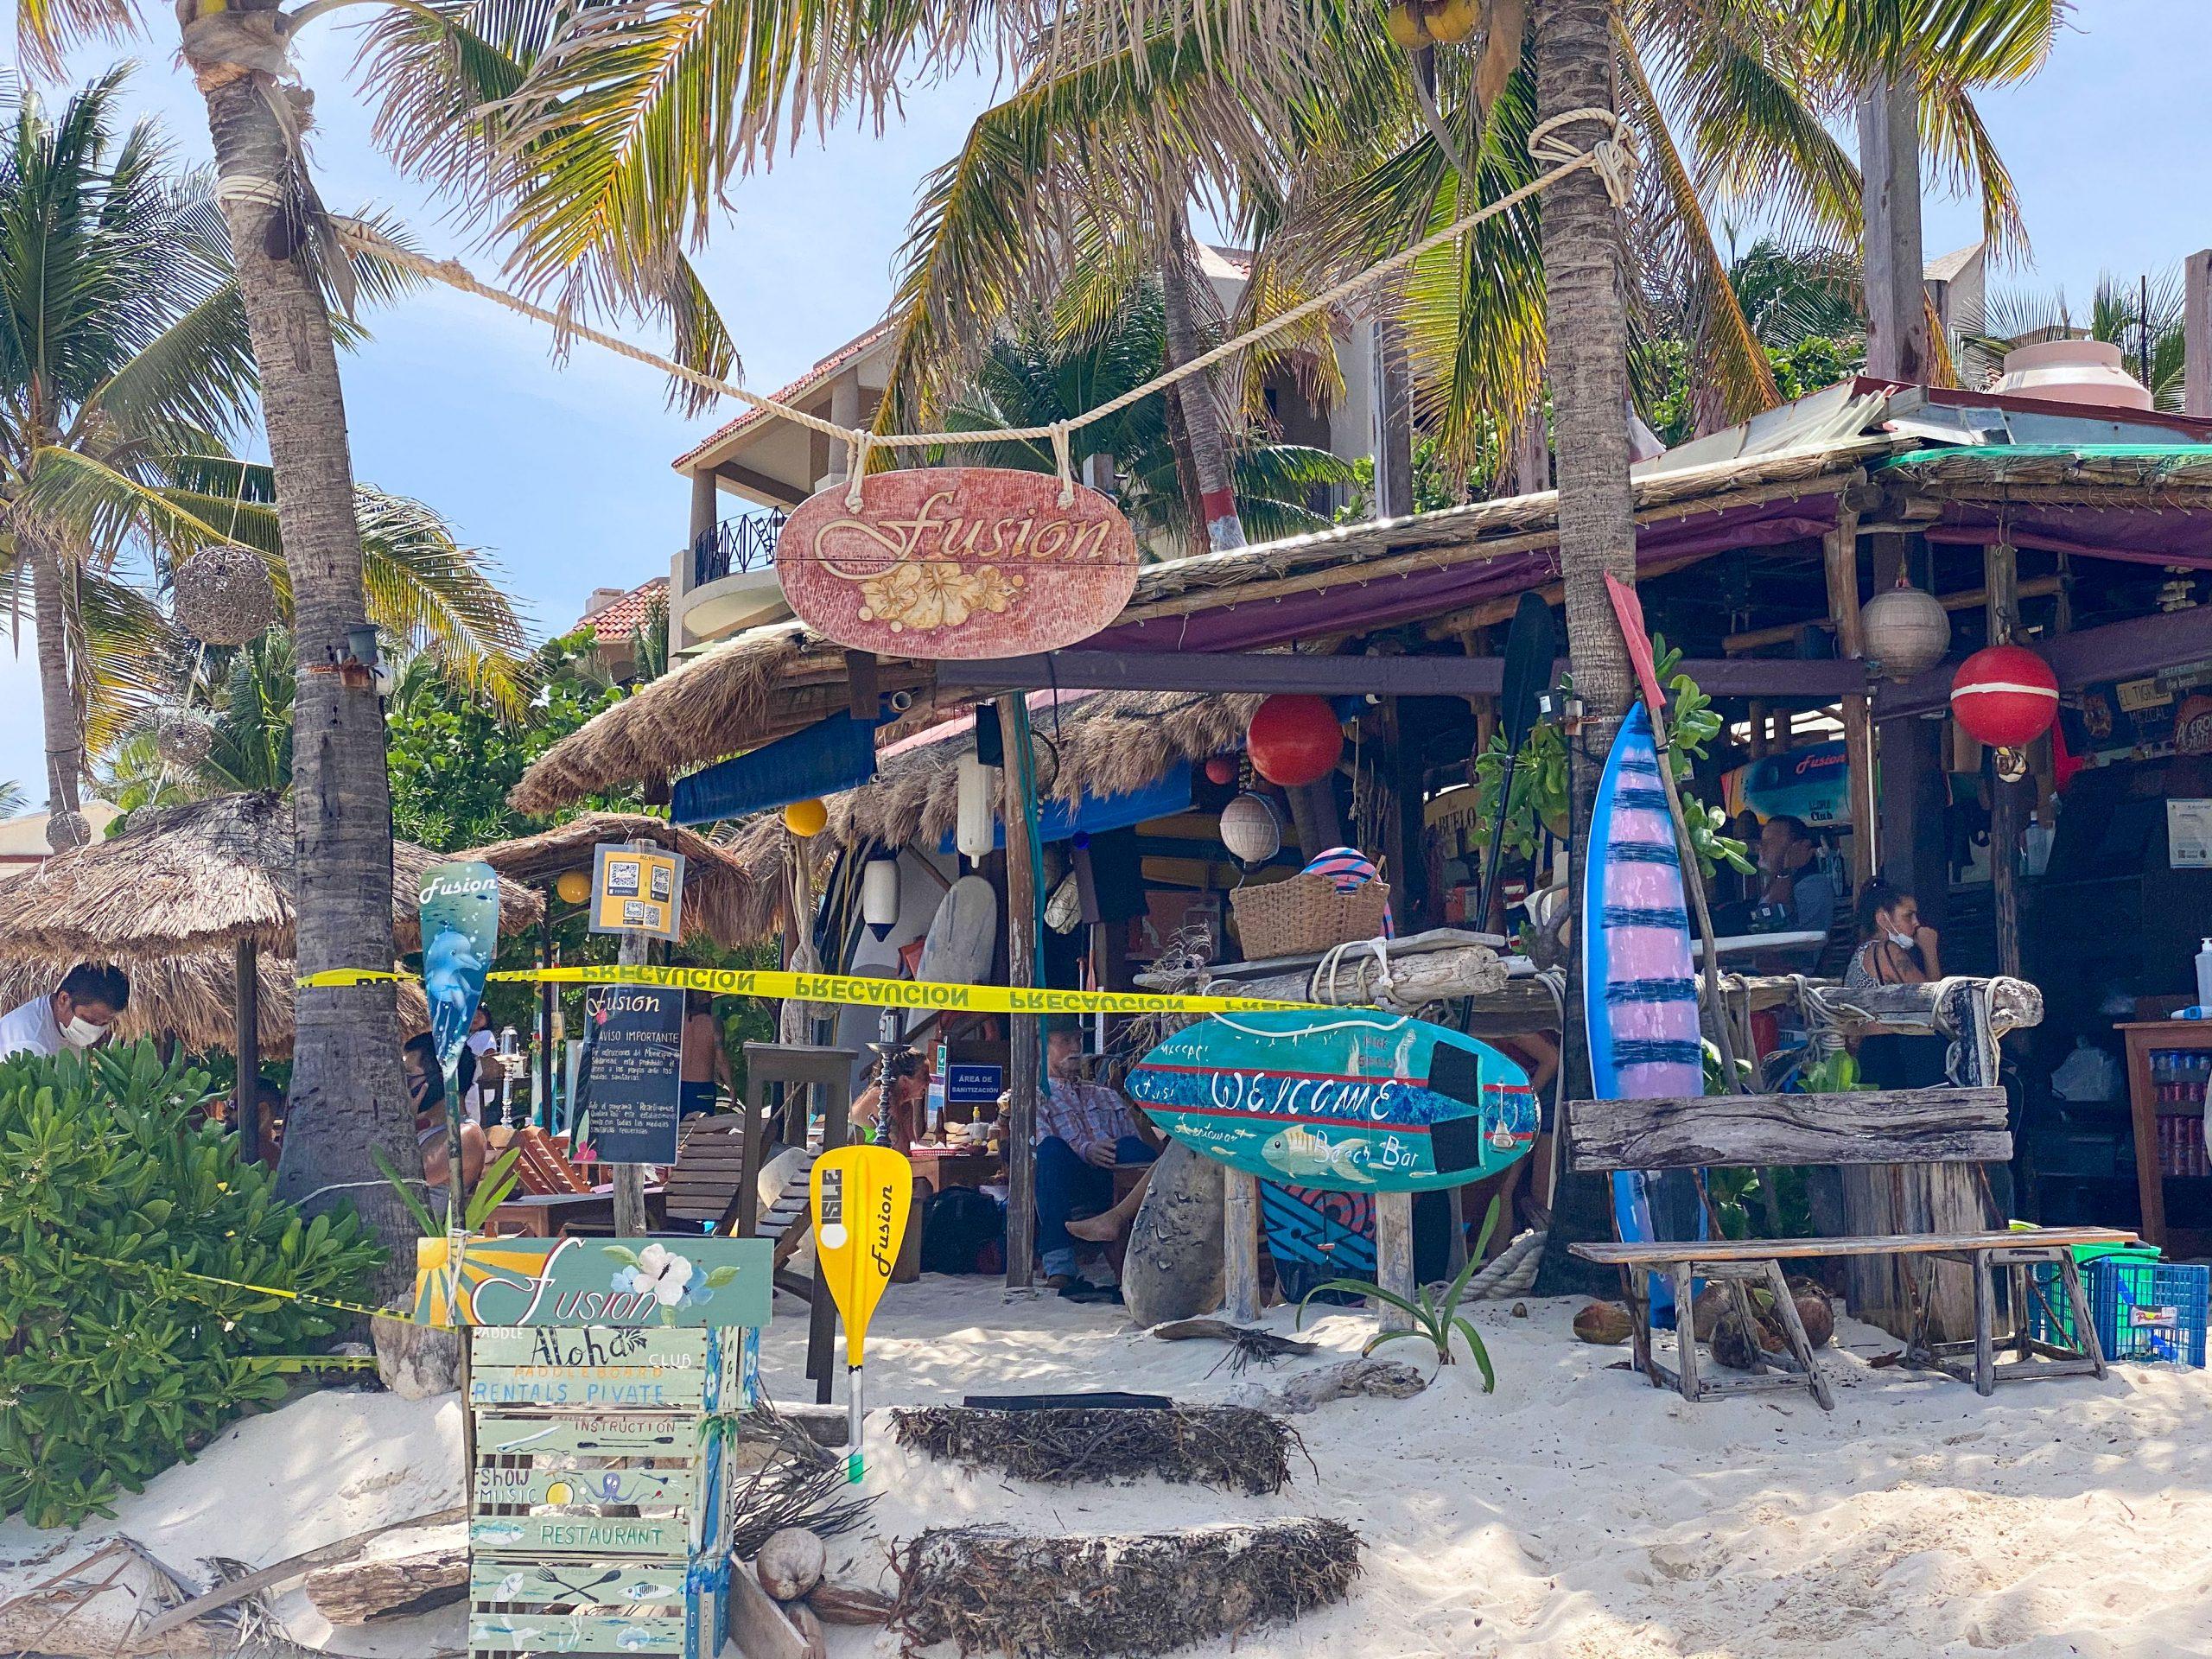 Fusion Beach Club exterior, underneath green palm trees on the beach.